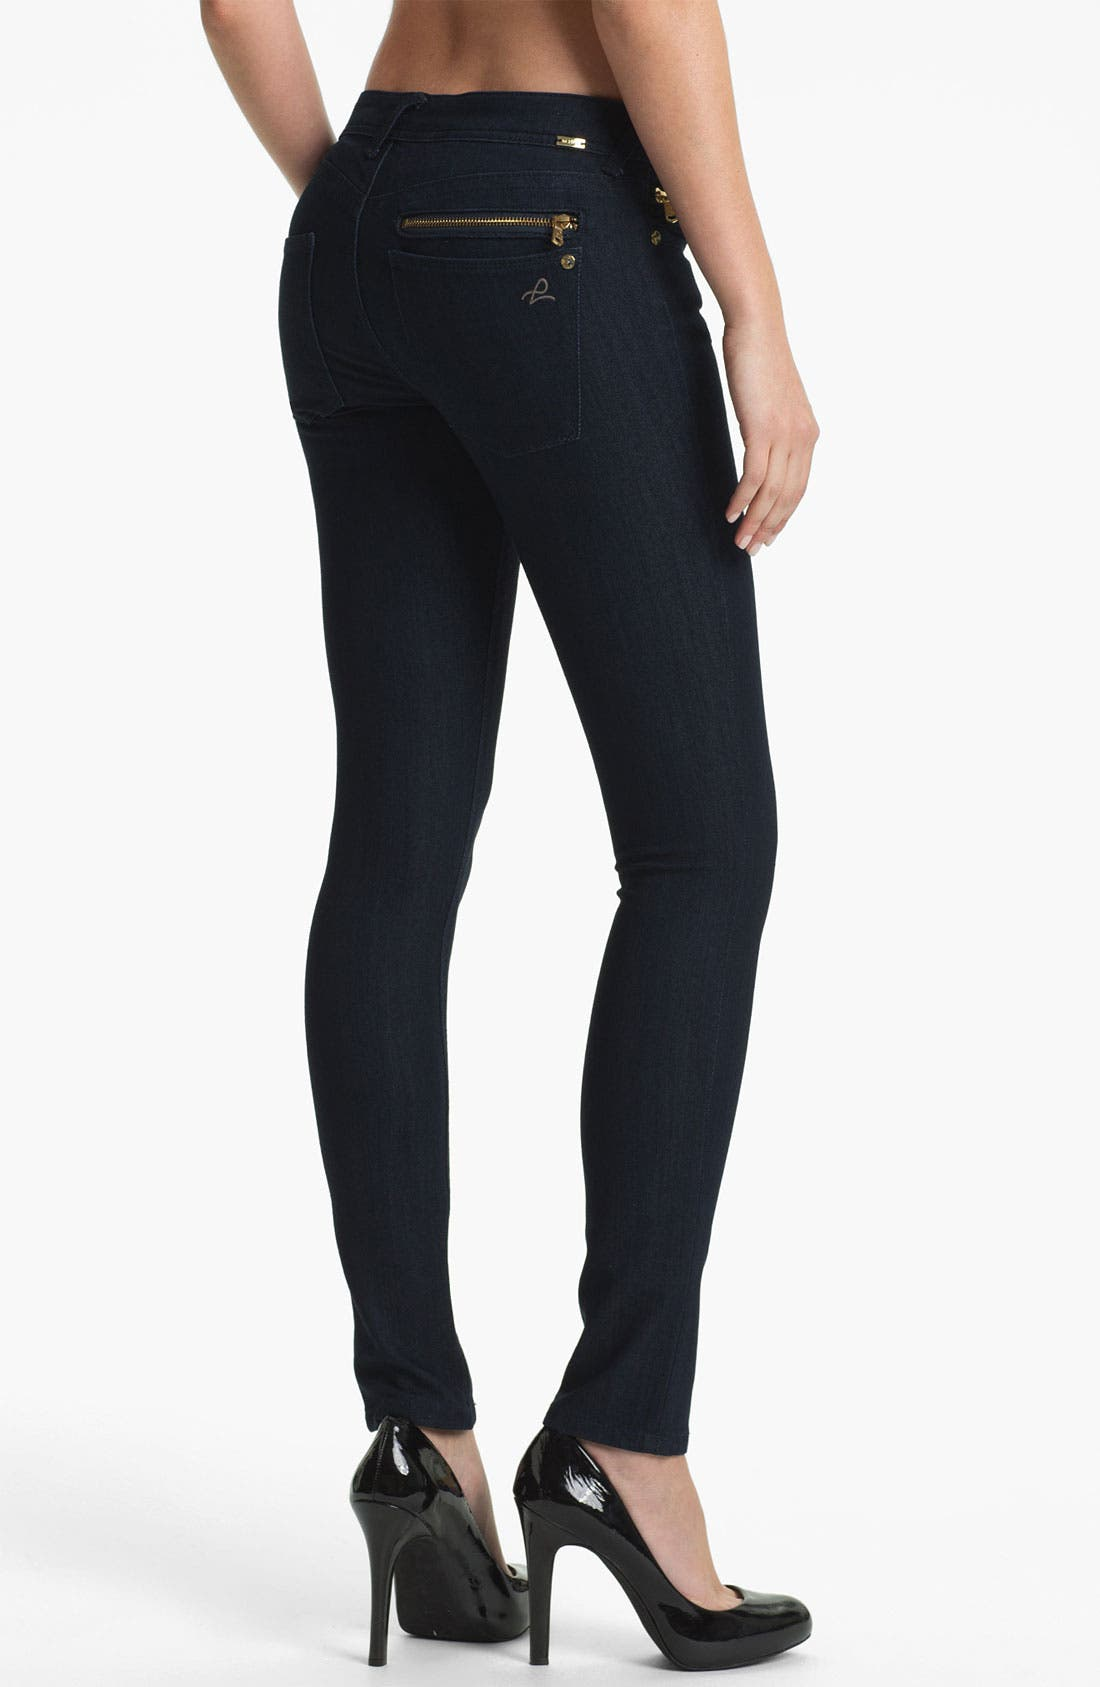 Alternate Image 2  - DL1961 'Amanda' X-Fit Stretch Denim Zip Pocket Skinny Jeans (Archer)